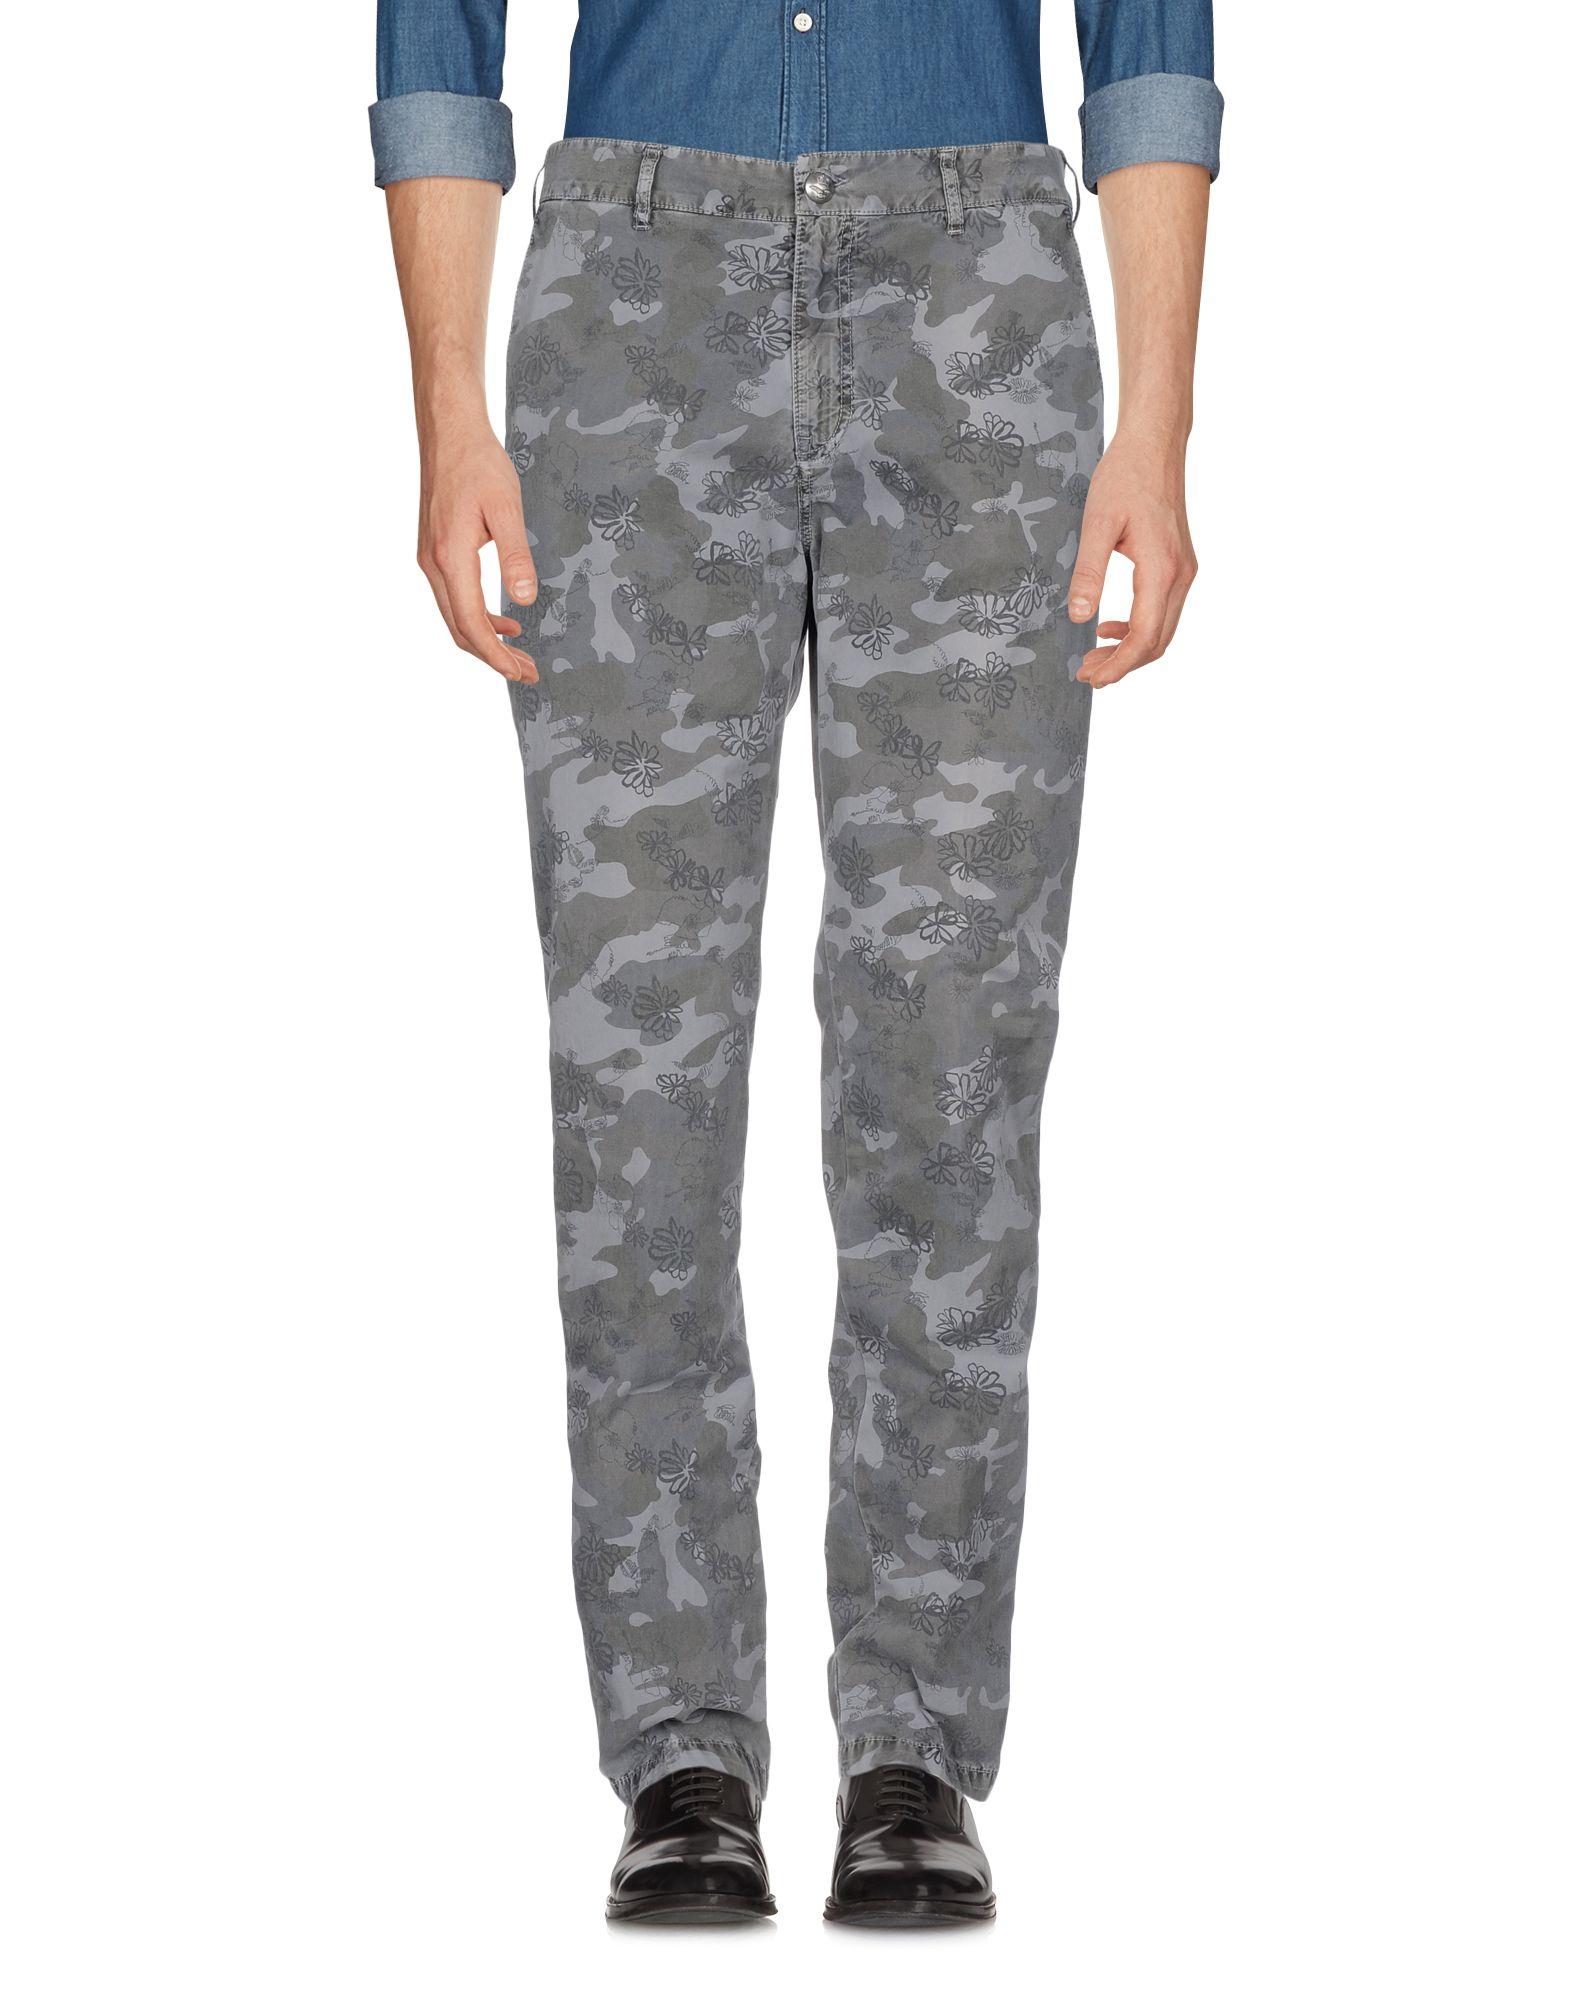 JEORDIE'S Повседневные брюки 19 70 genuine wear повседневные брюки